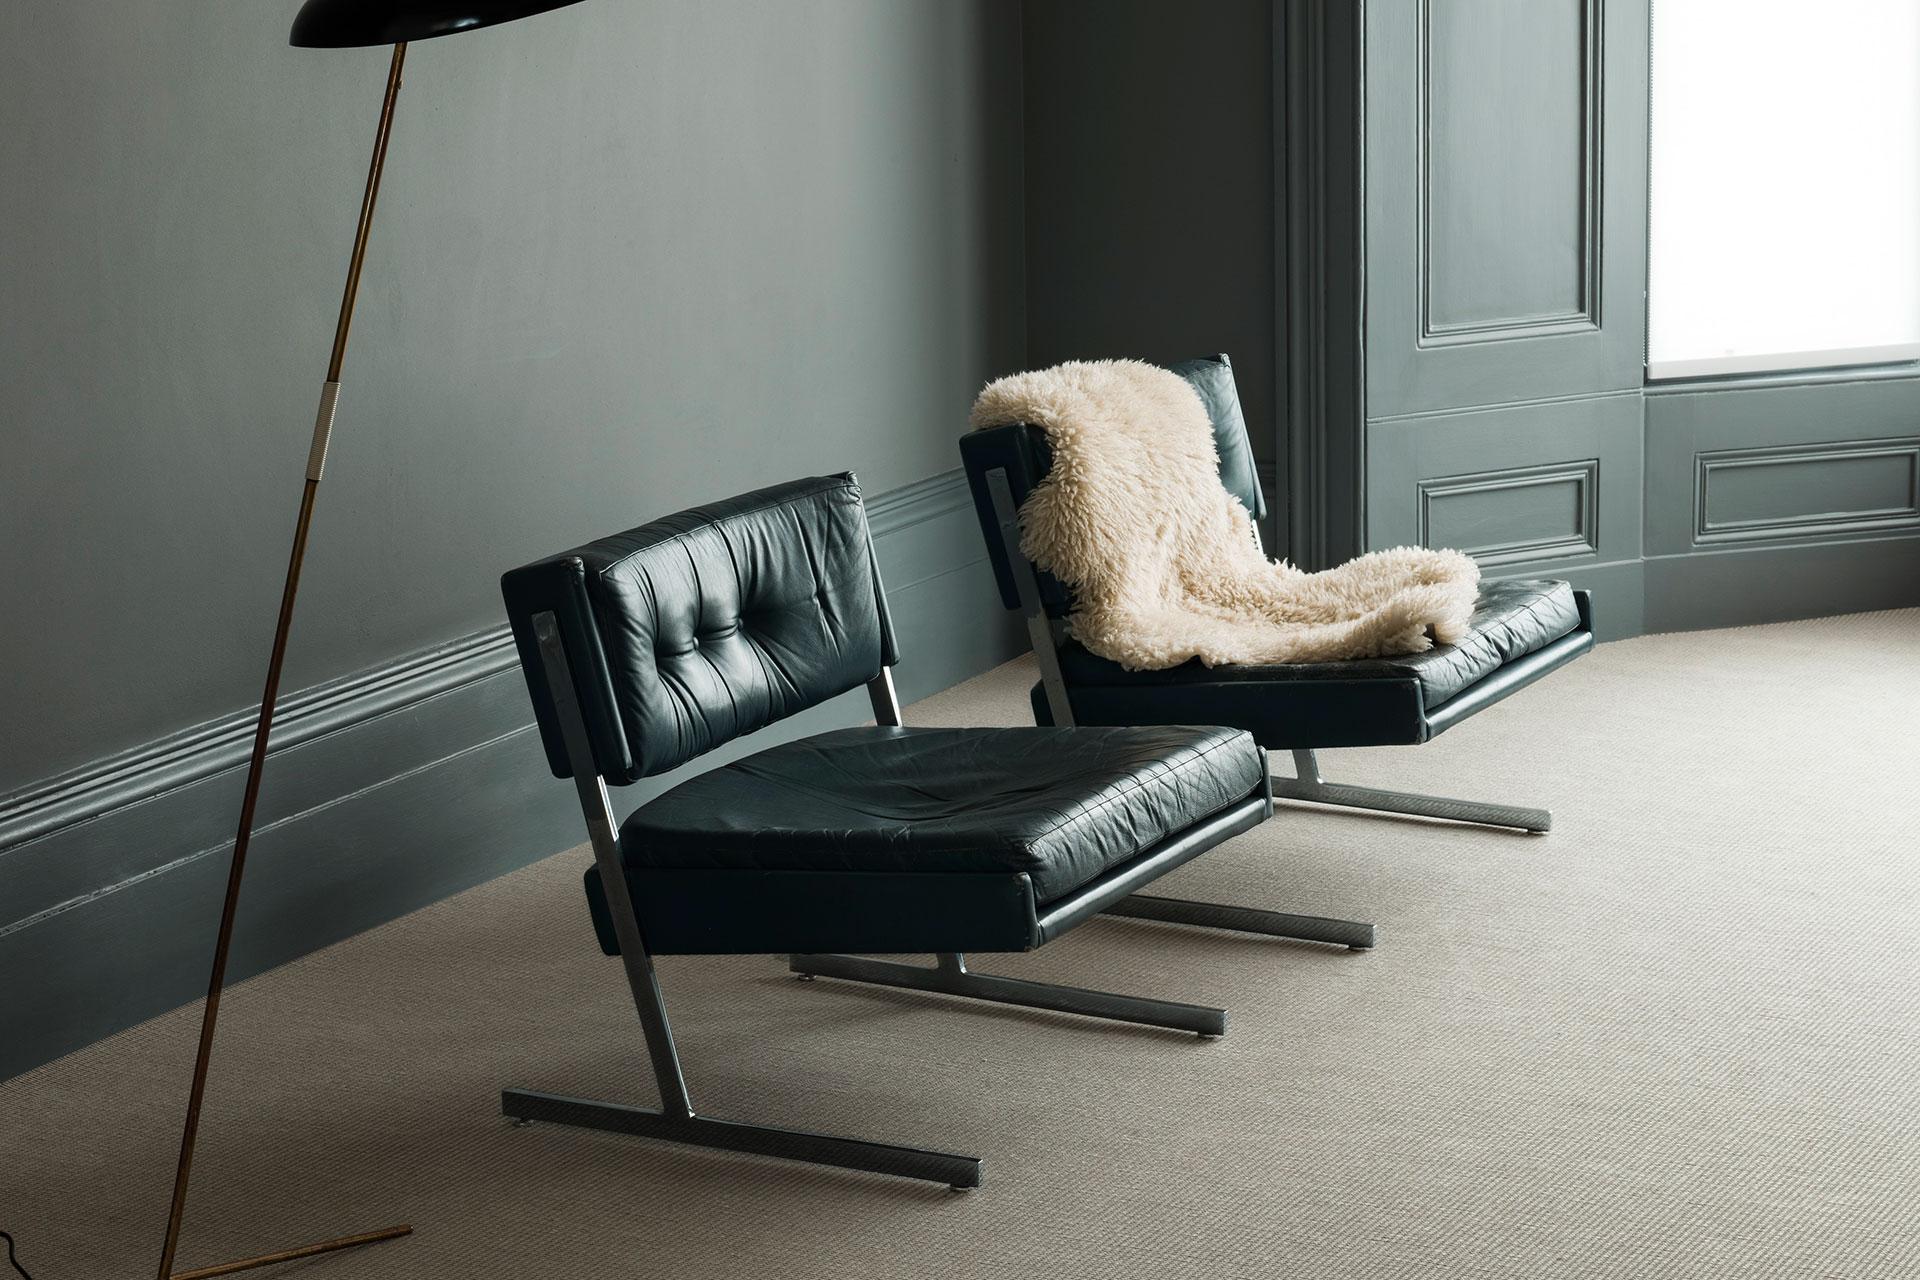 Hamilton Flooring Ltd